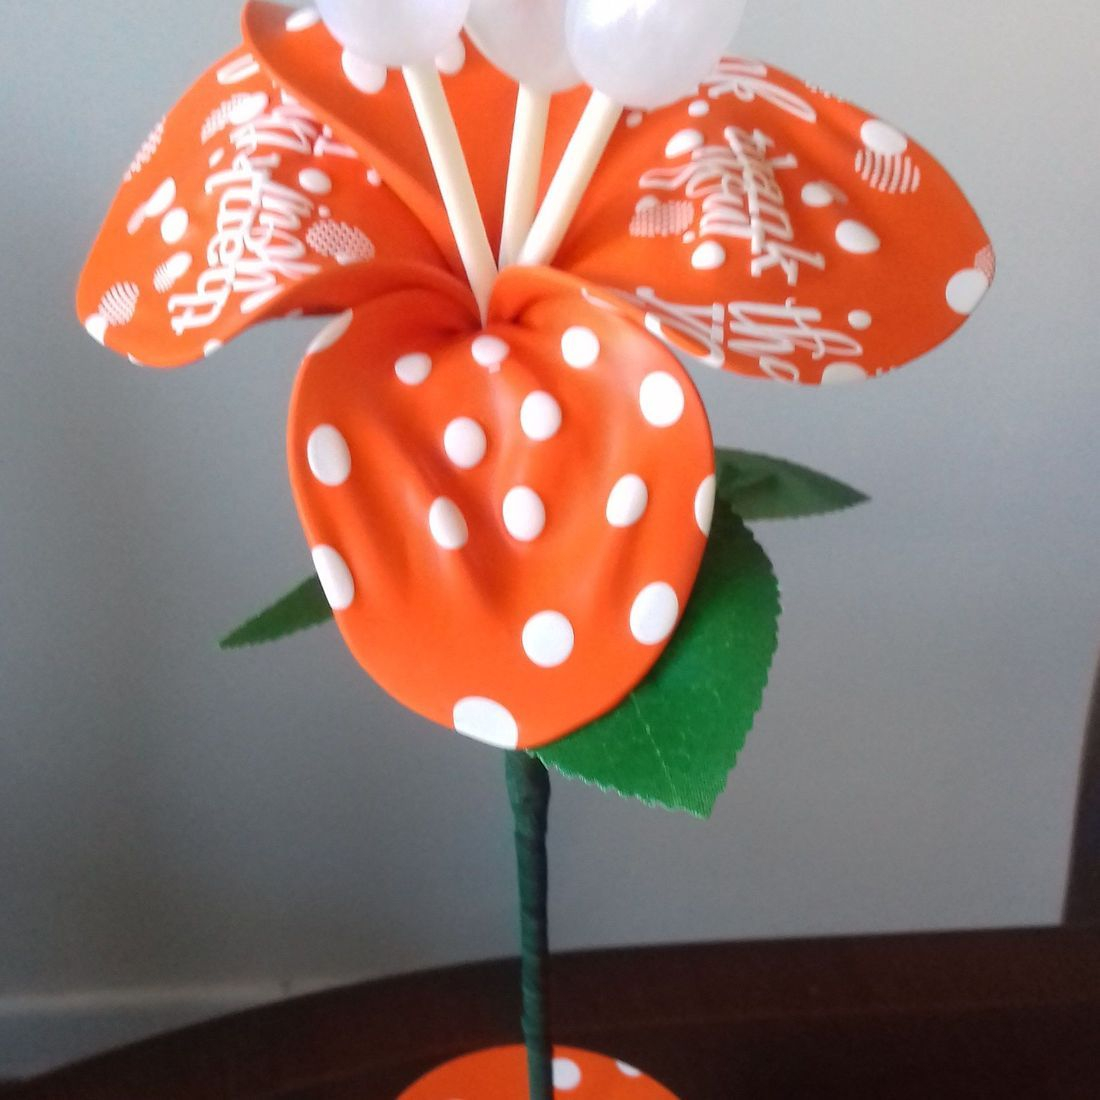 Bespoke balloon designs